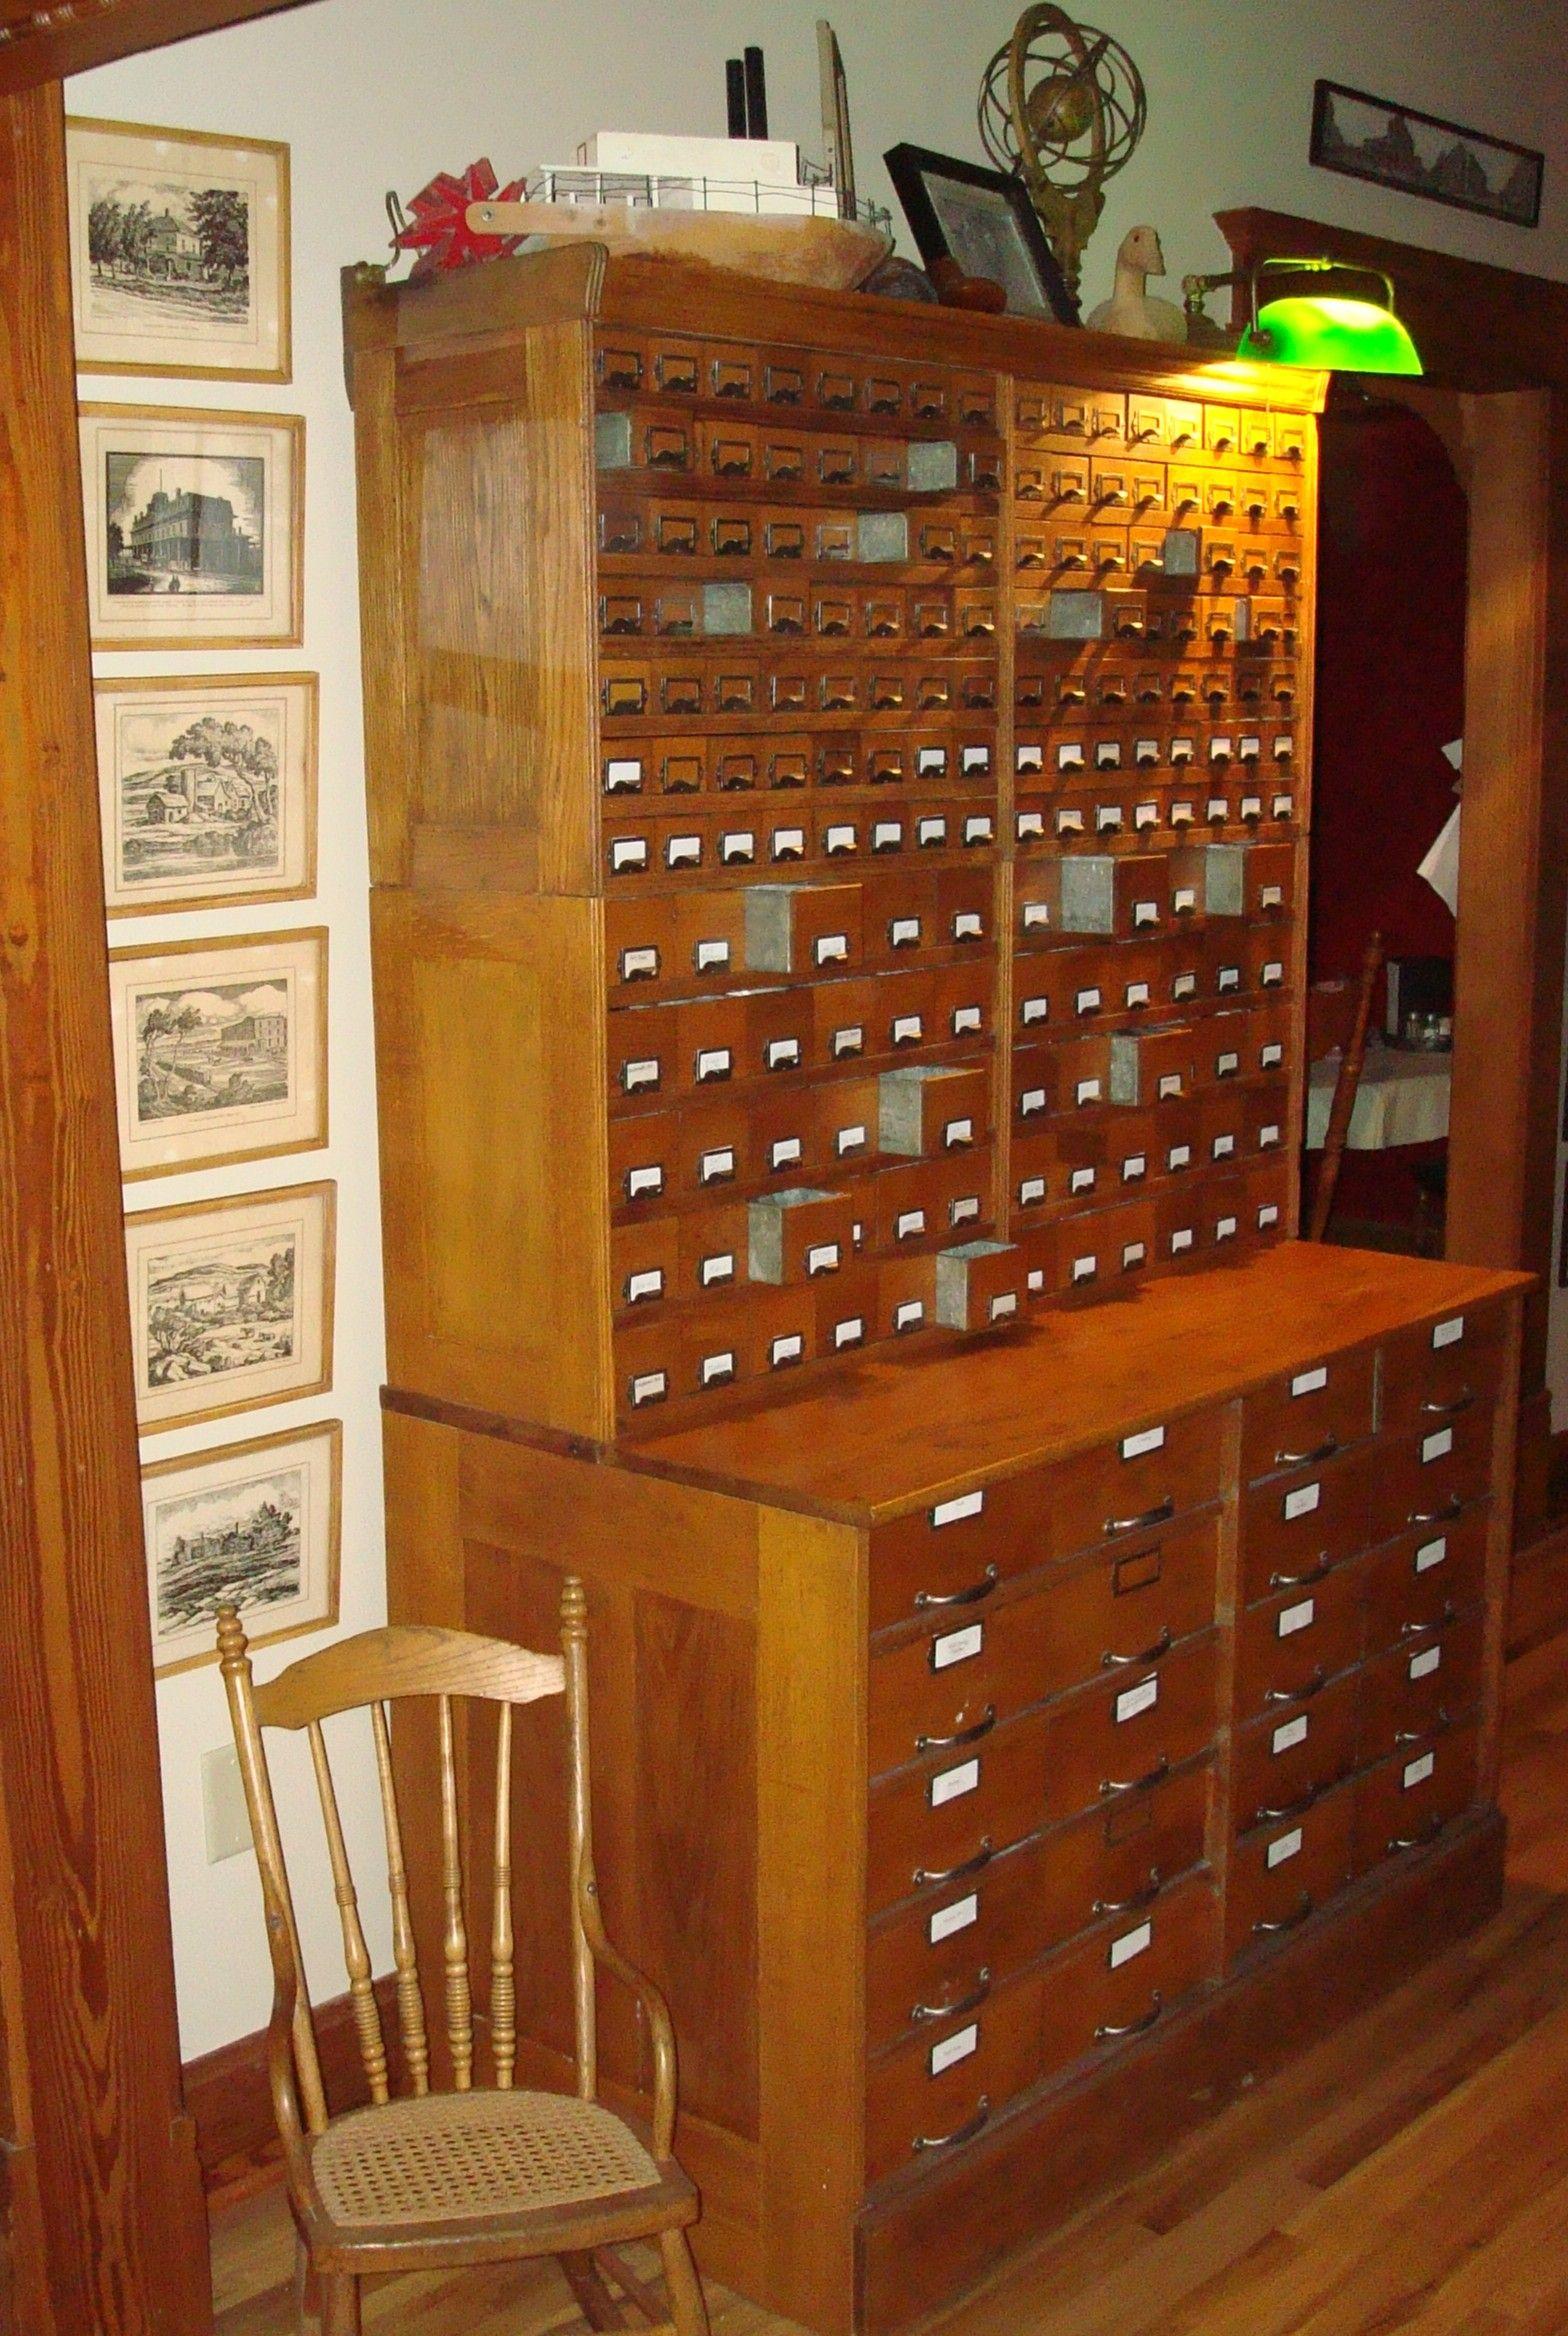 Antique bolt Cabinet - I love drawers! | Likes | Pinterest ...